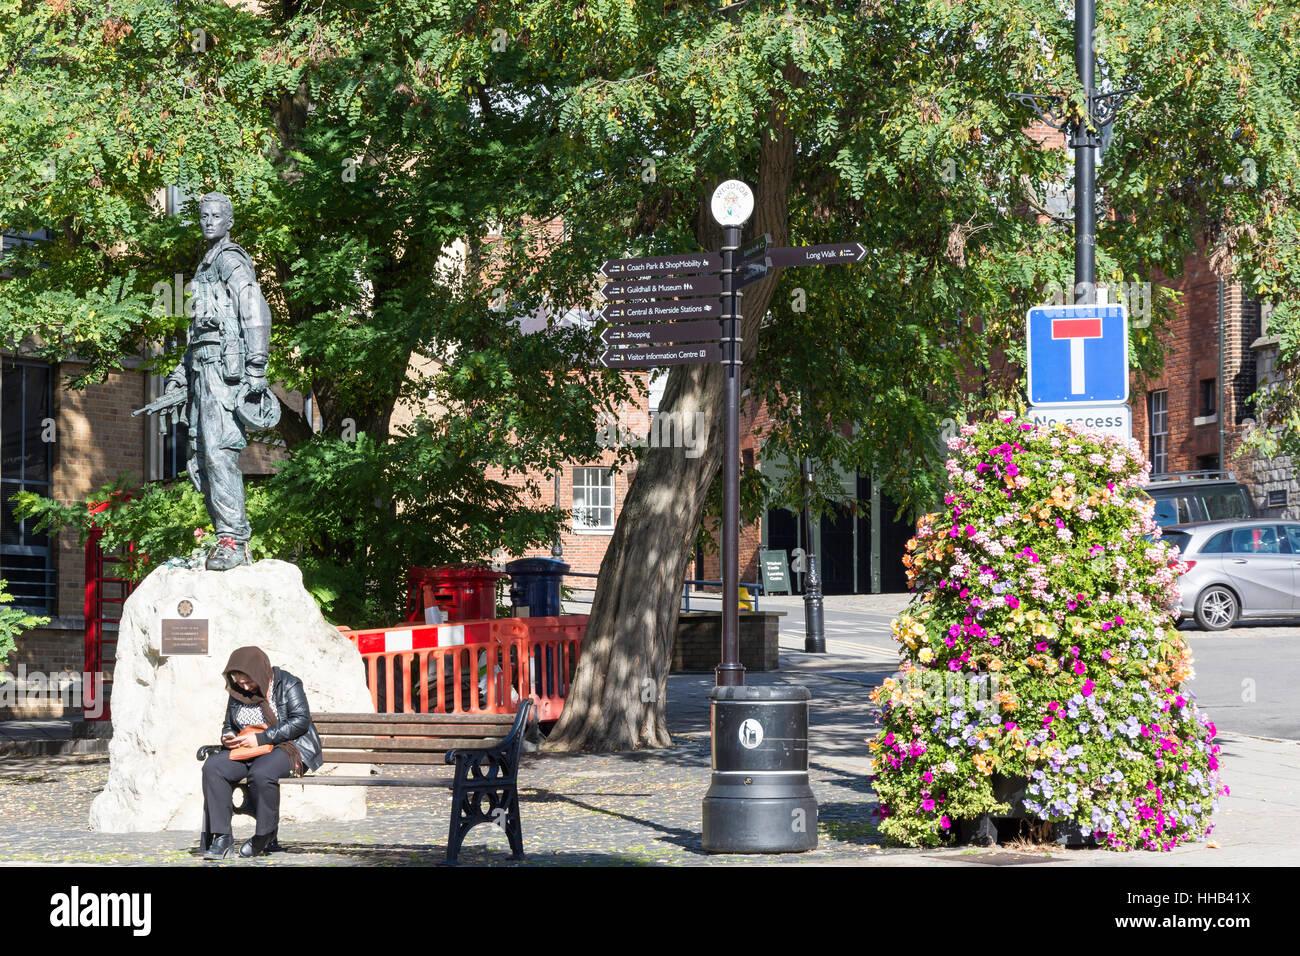 Irish Guardsmen statue, Sheet Street, Windsor, Berkshire, England, United Kingdom - Stock Image